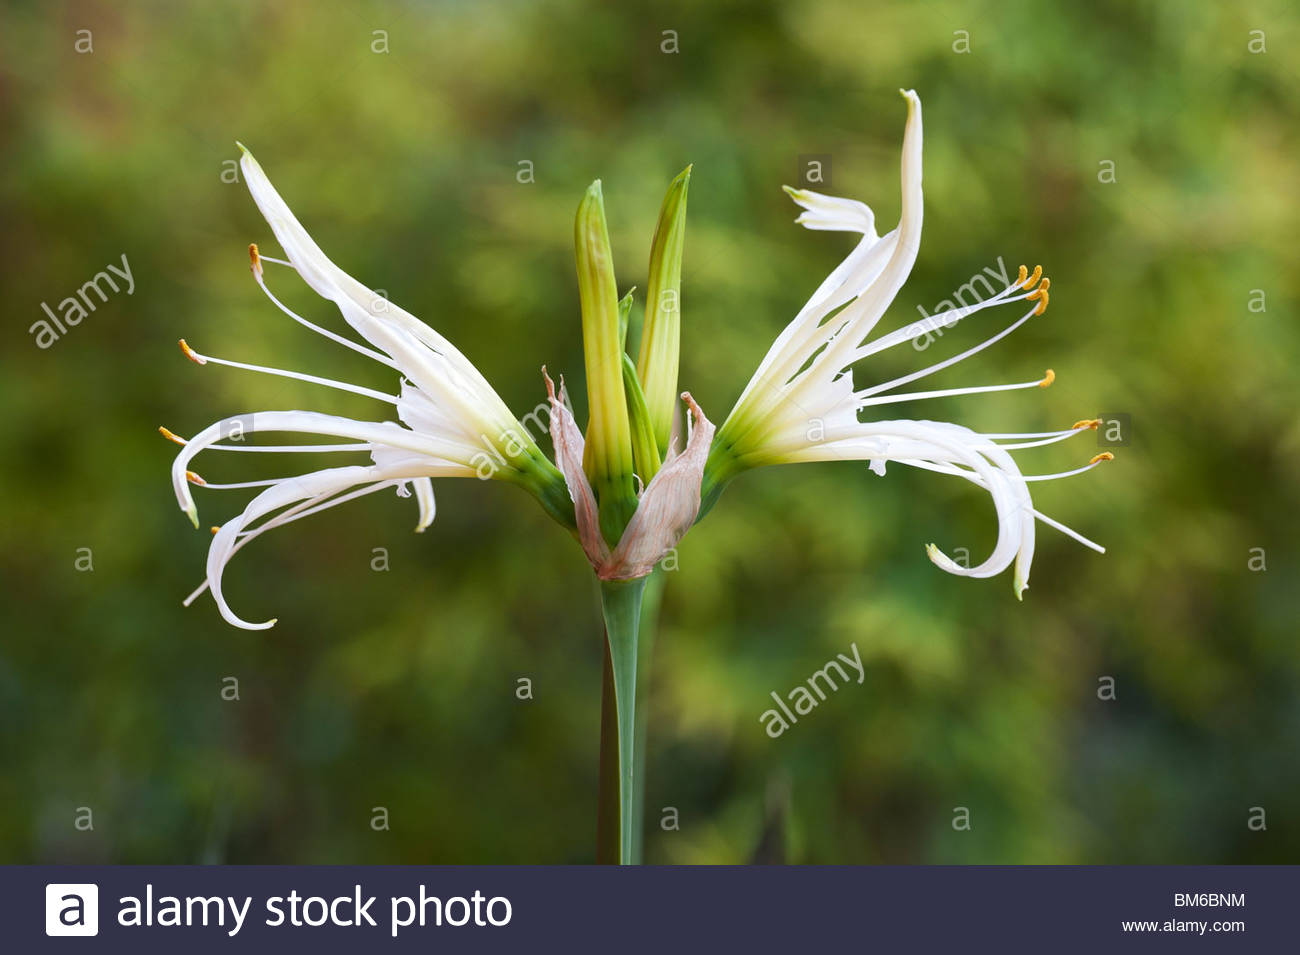 Hymenocallis longipetala spider lily flower in india stock photo hymenocallis longipetala spider lily flower in india izmirmasajfo Image collections